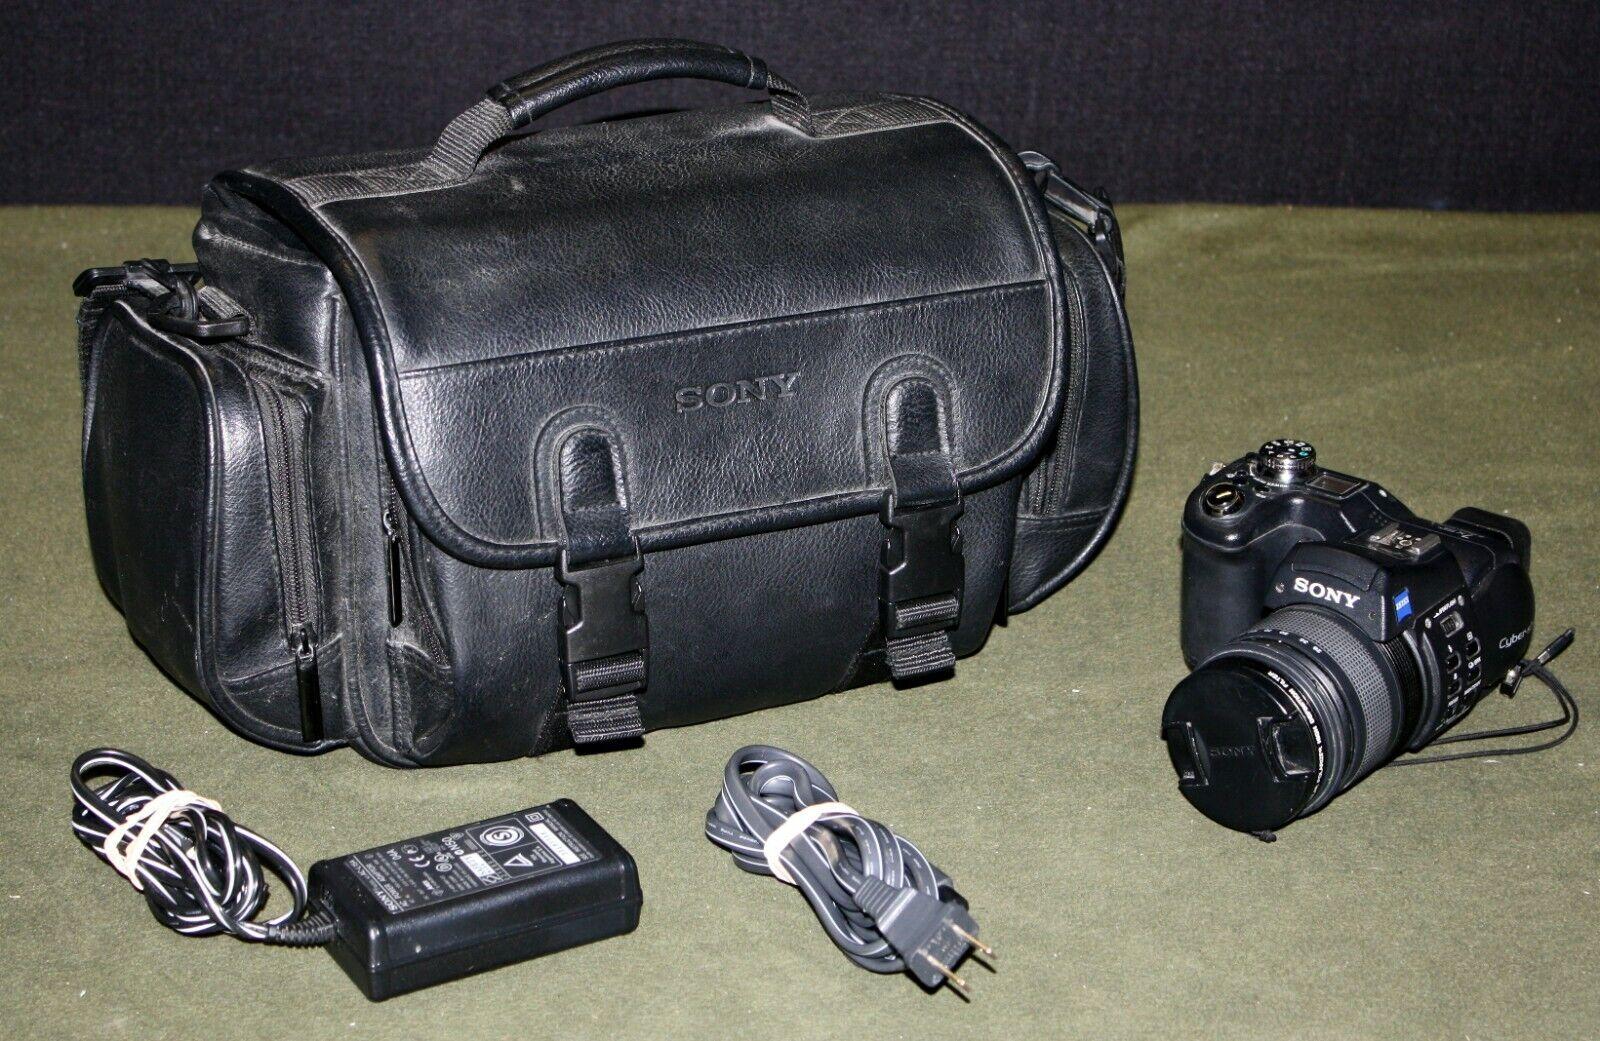 Sony Cyber-Shot DSC-F828 8.0MP Digital Camera - Black - $99.95